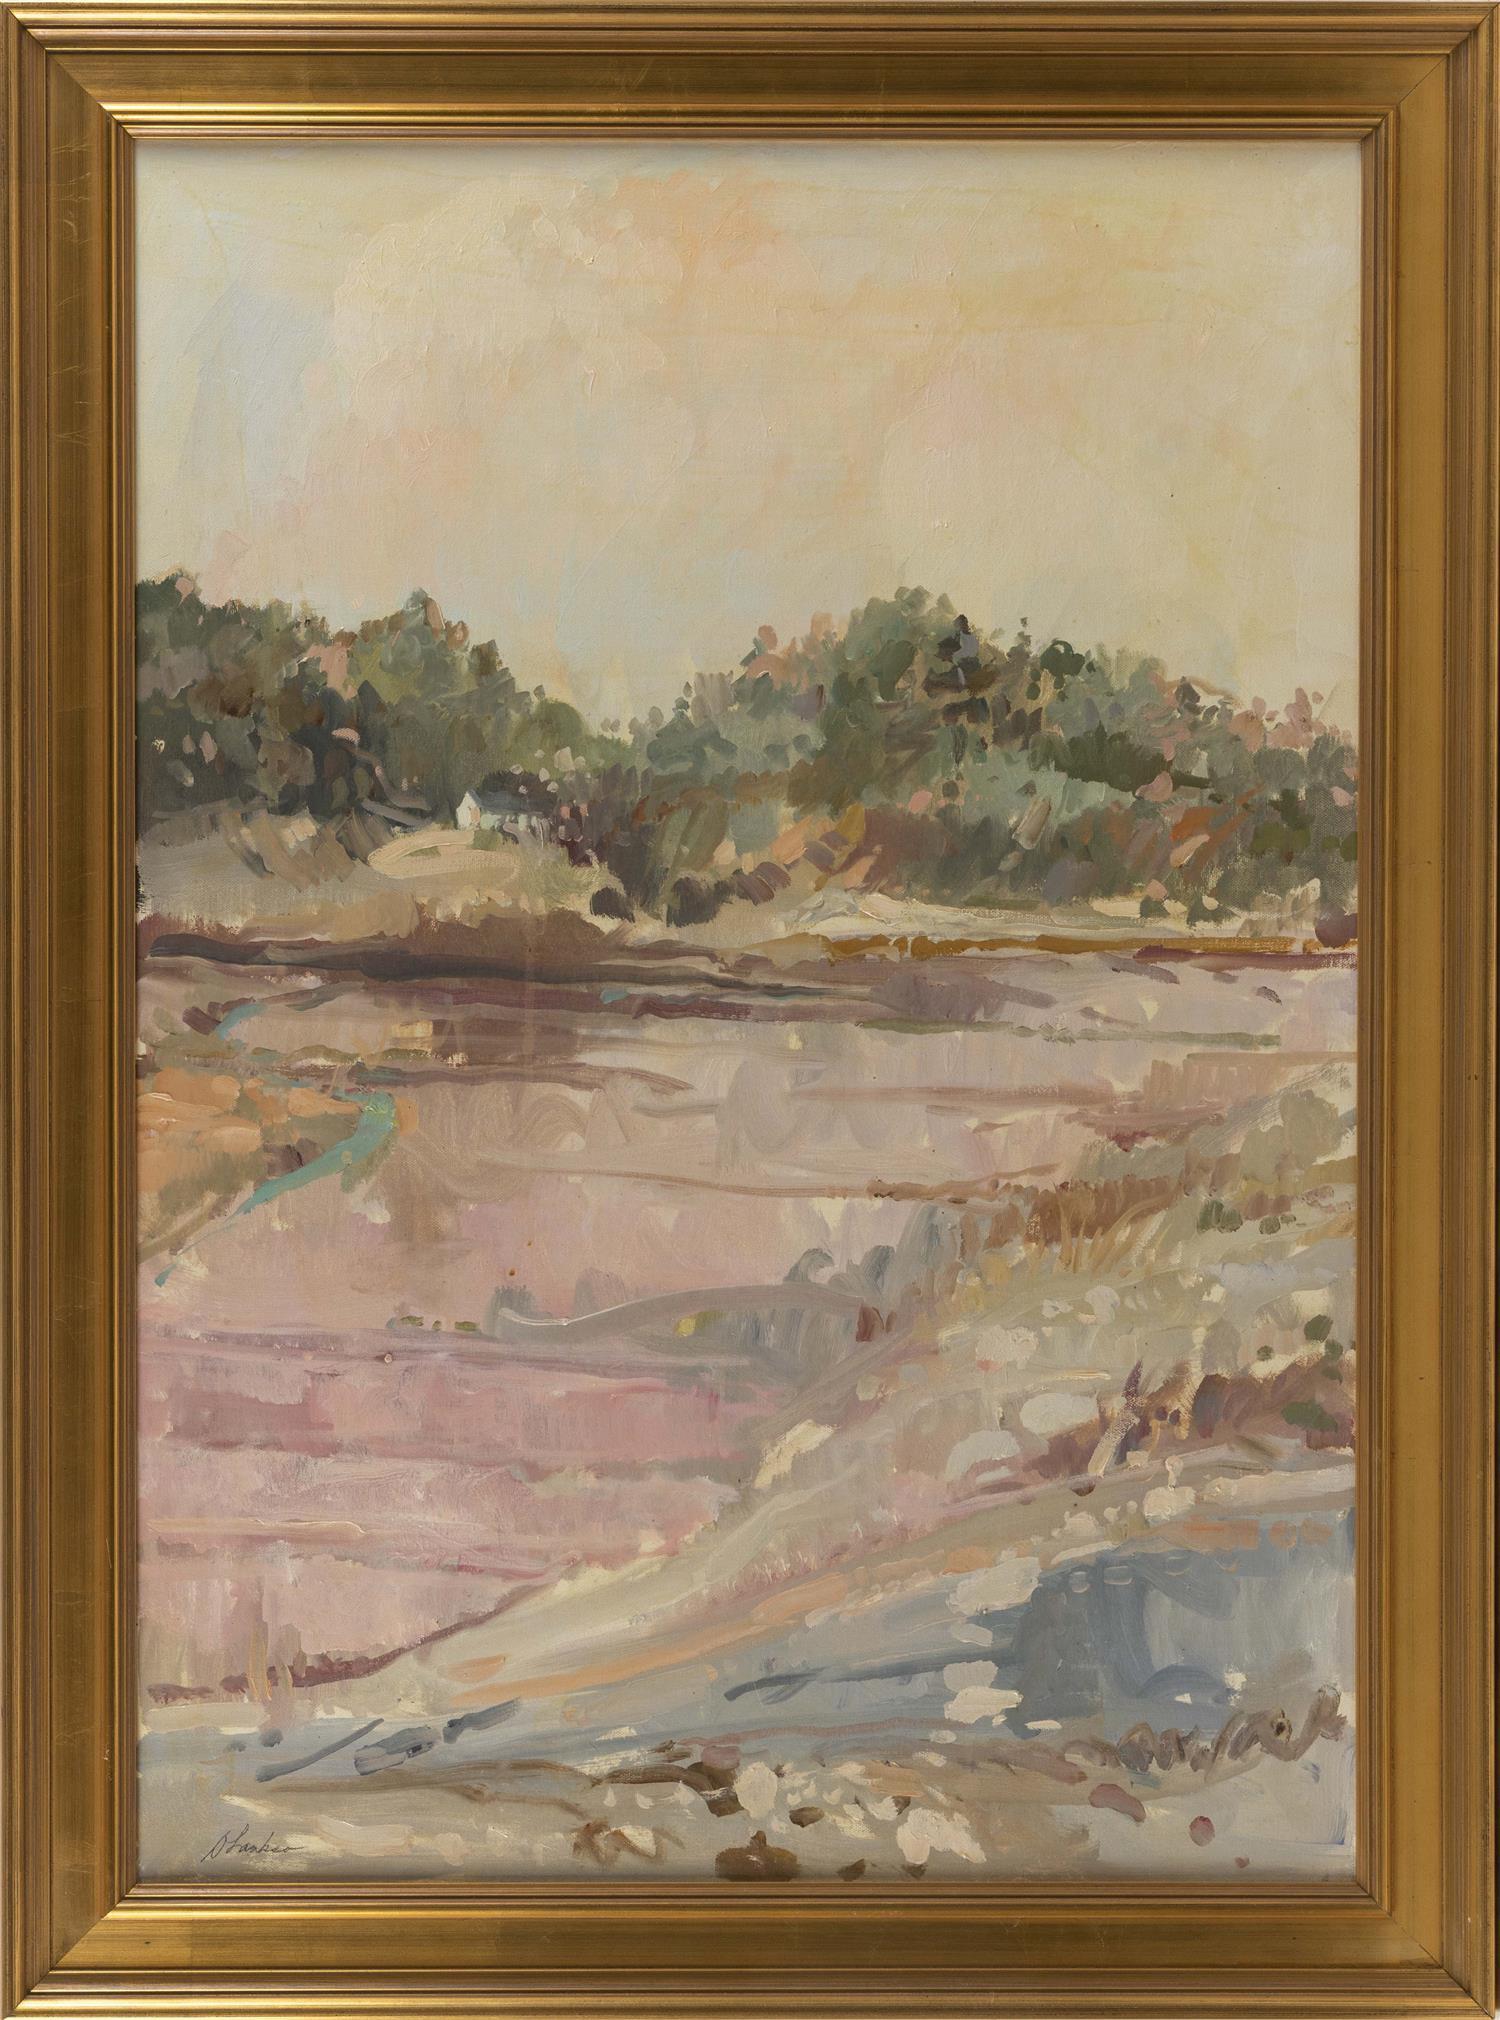 "DAVID LAASKO, America, Contemporary, Pastoral landscape., Oil on canvas, 34"" x 24"". Framed 39"" x 29""."